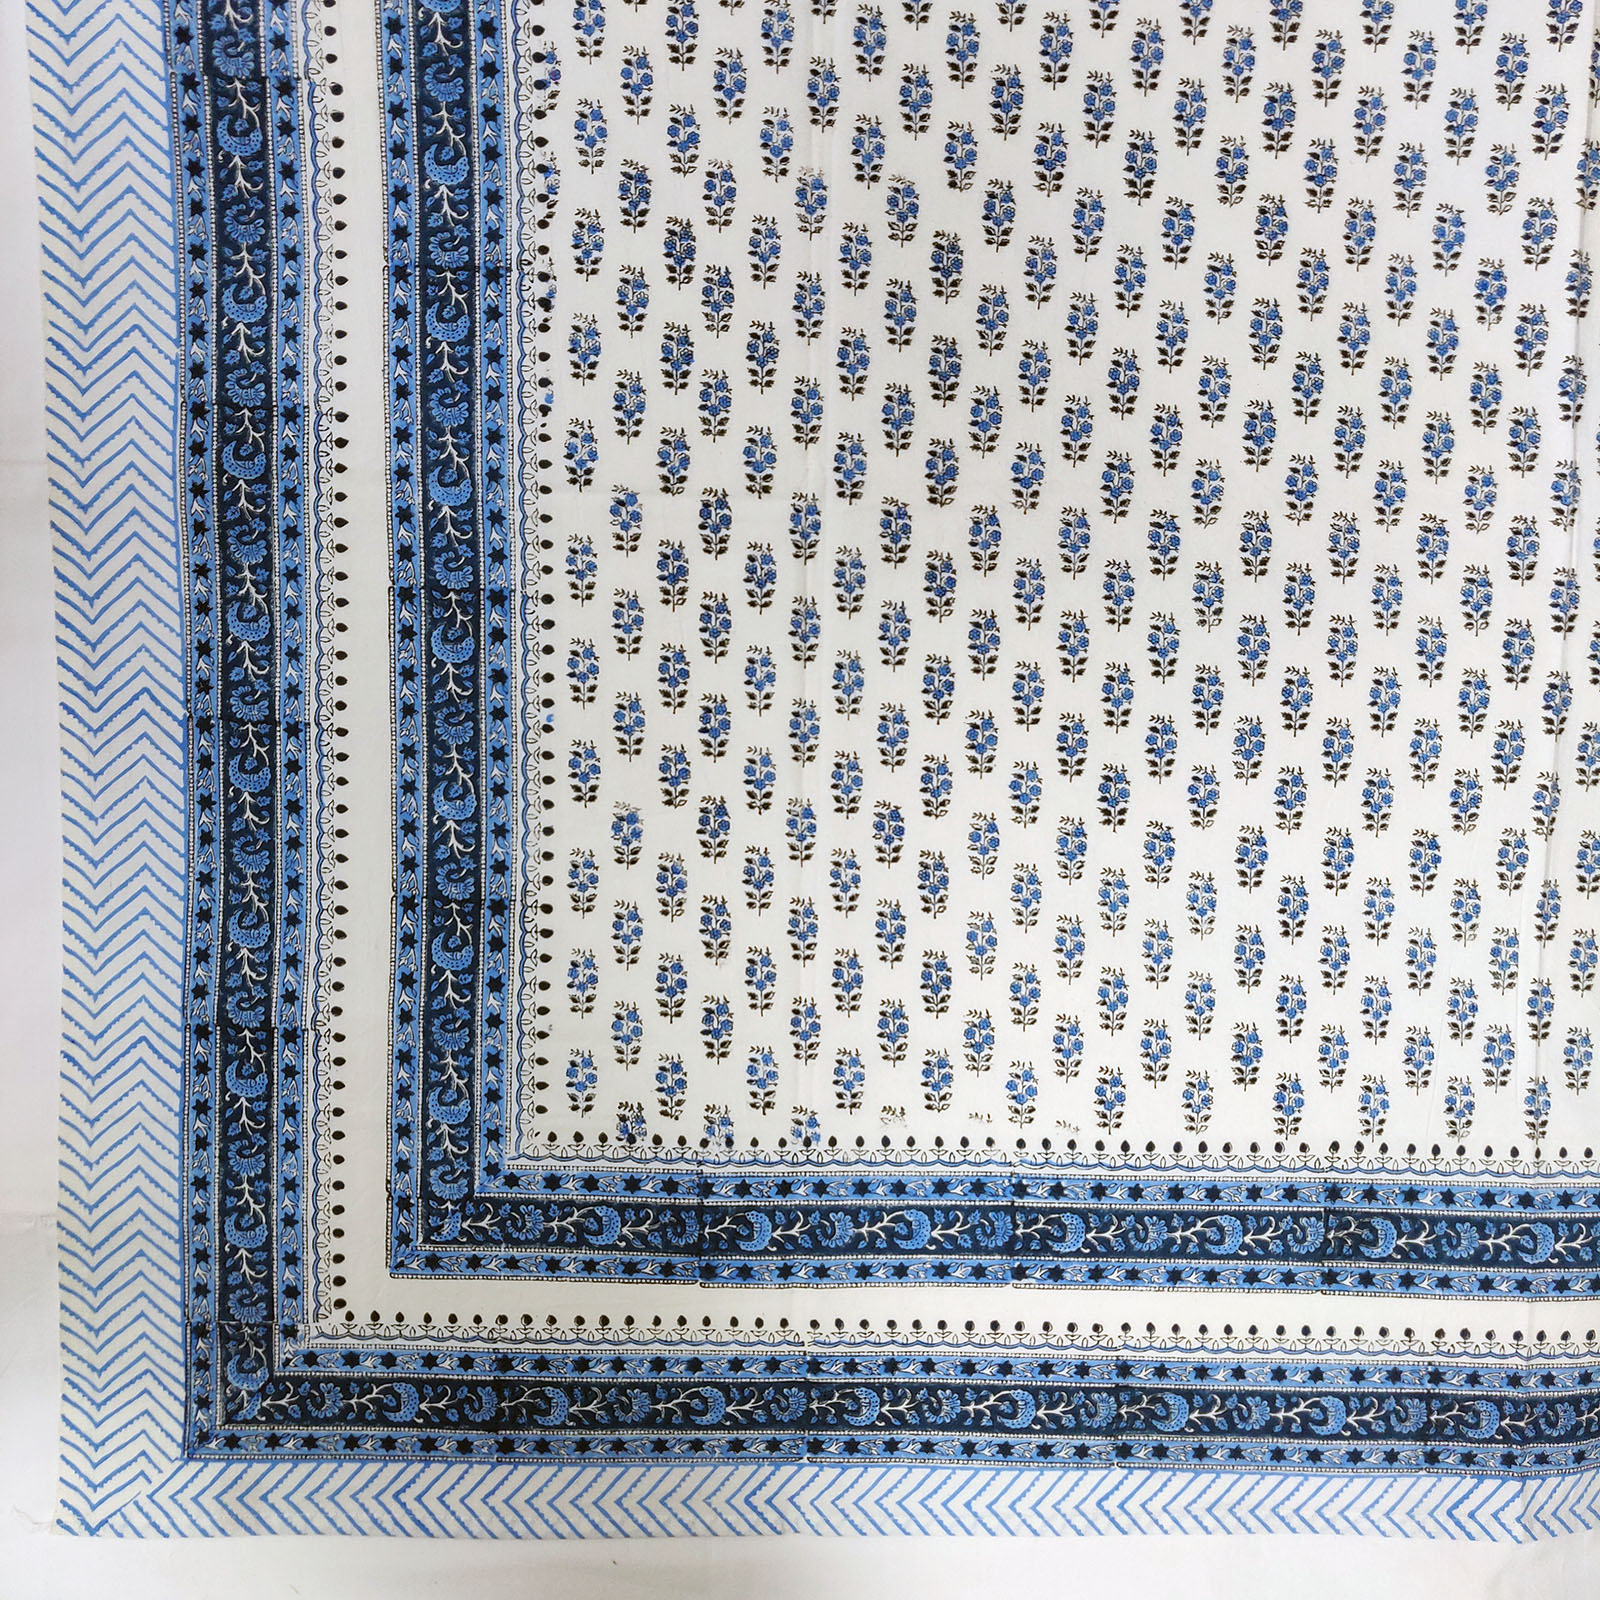 Small Blue Floral Buttas Single Bedsheet